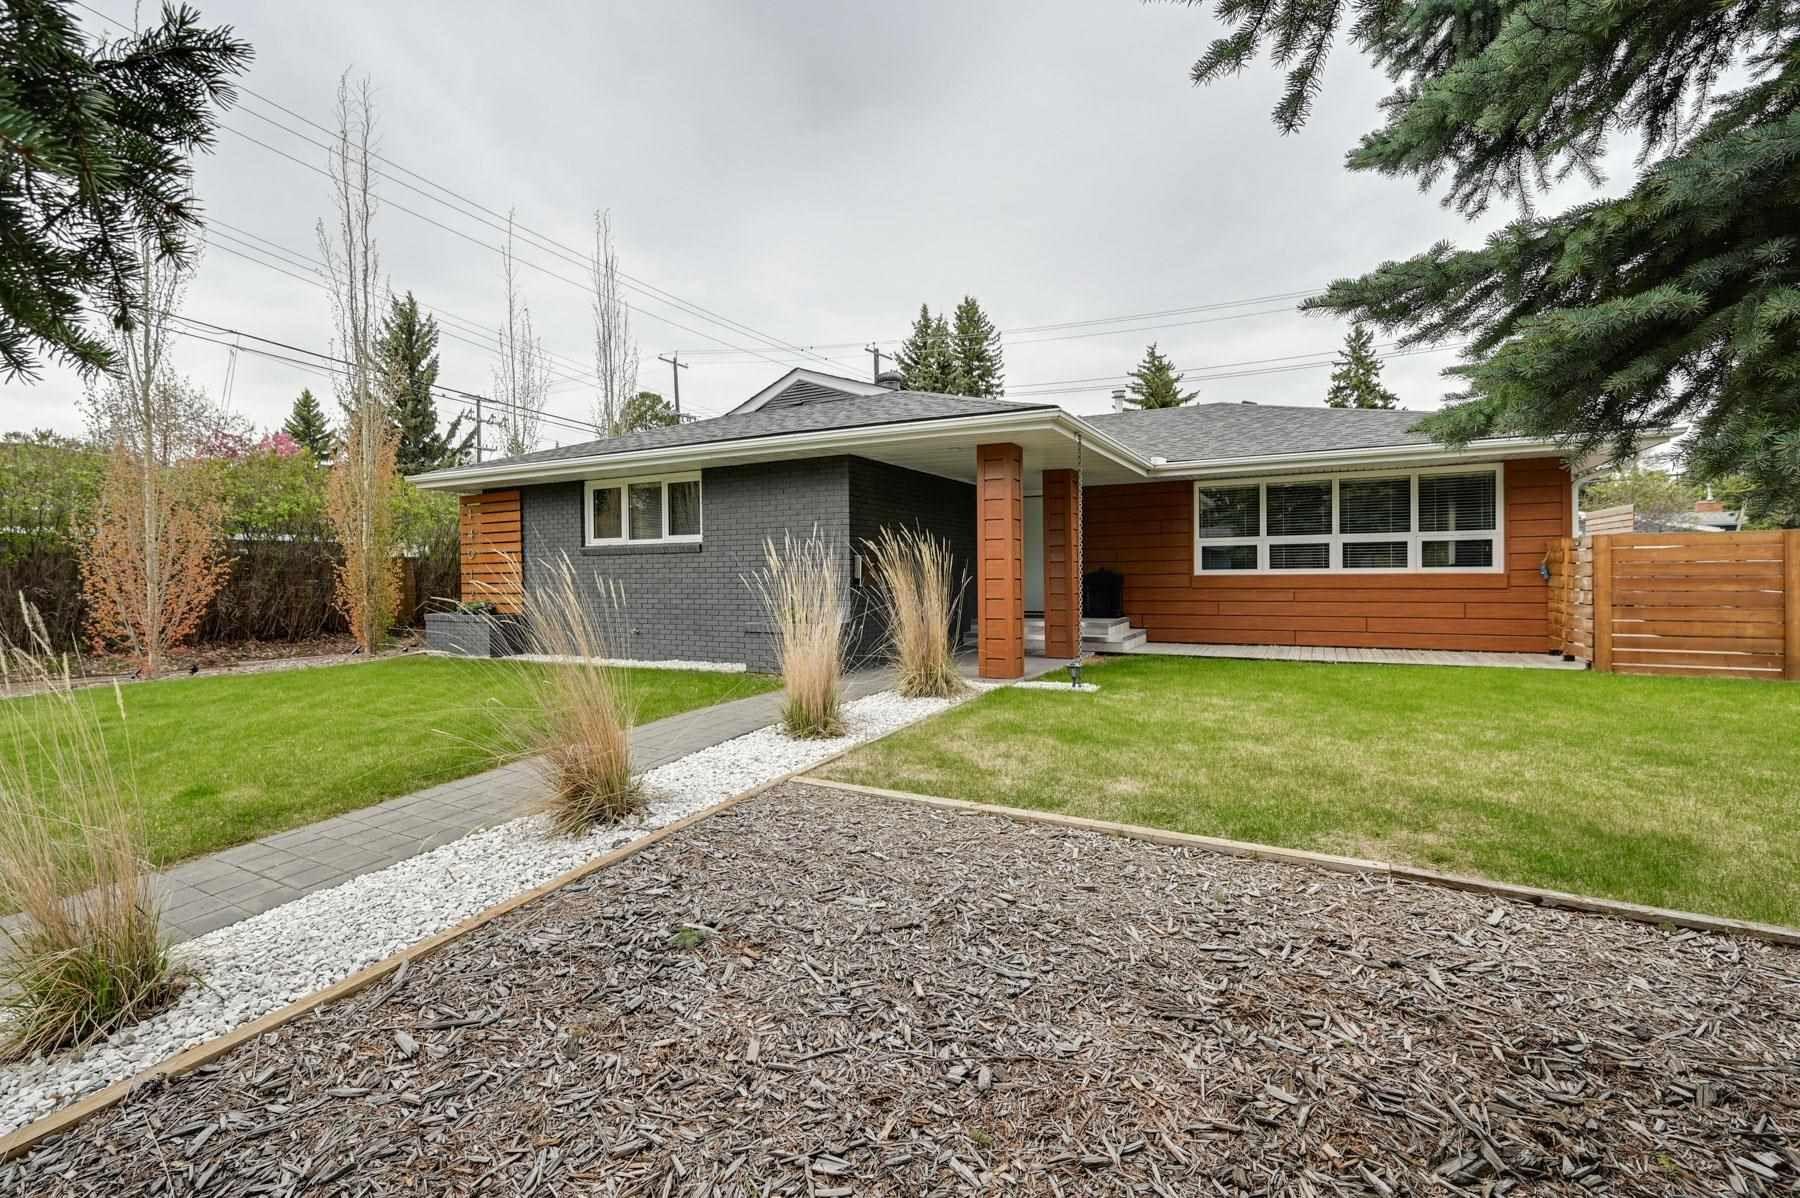 Main Photo: 14012 80 Avenue in Edmonton: Zone 10 House for sale : MLS®# E4245248